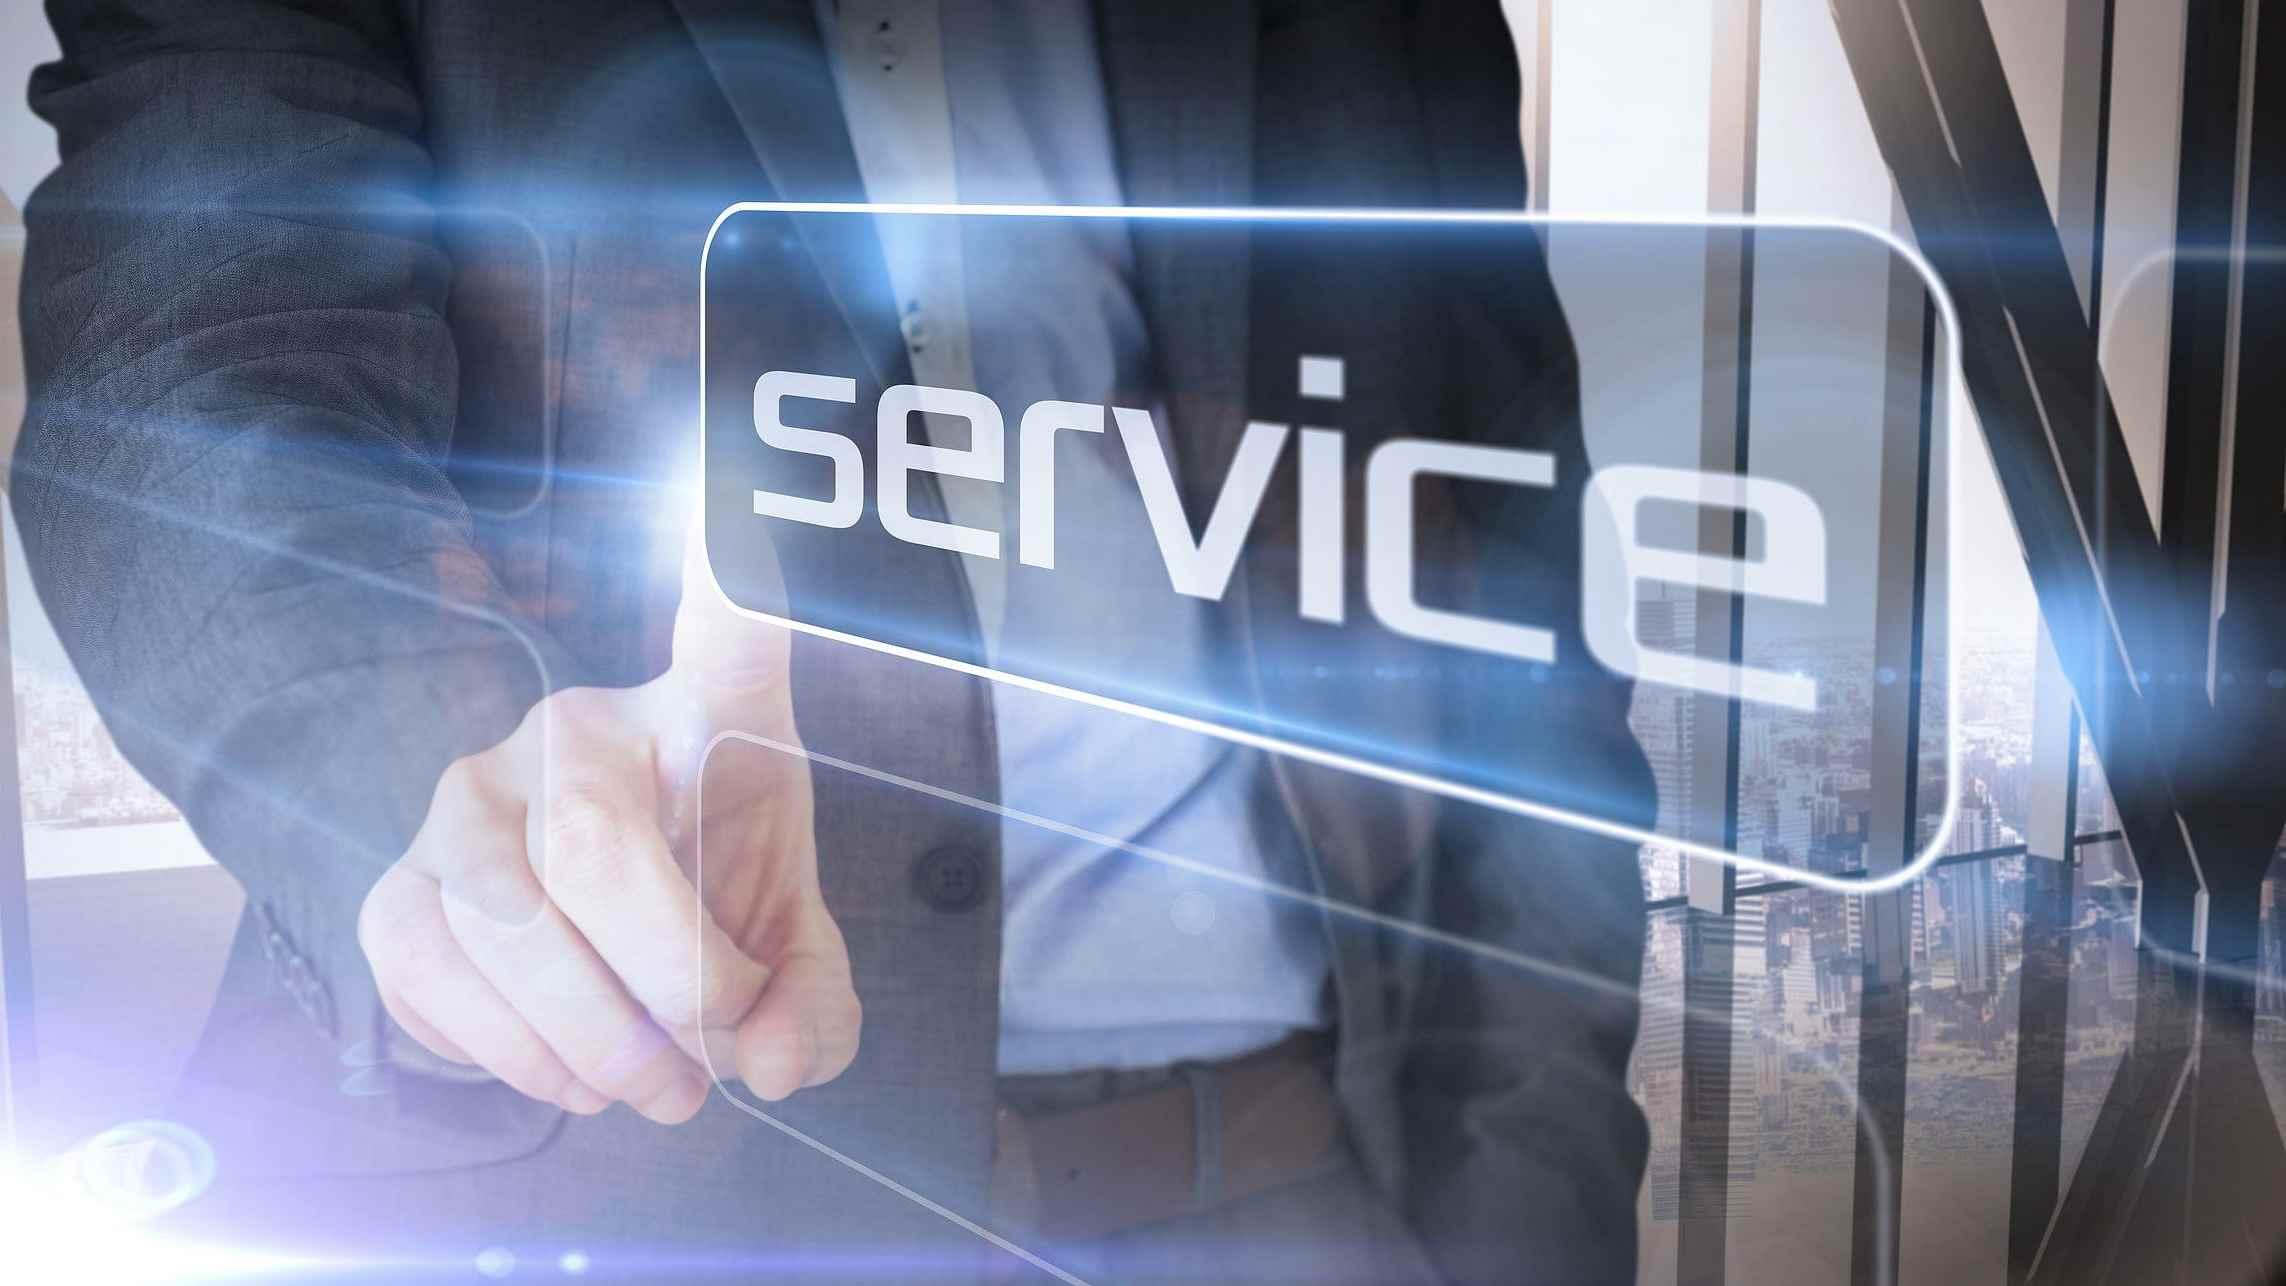 SERVICE TRADE CGTN.jpg